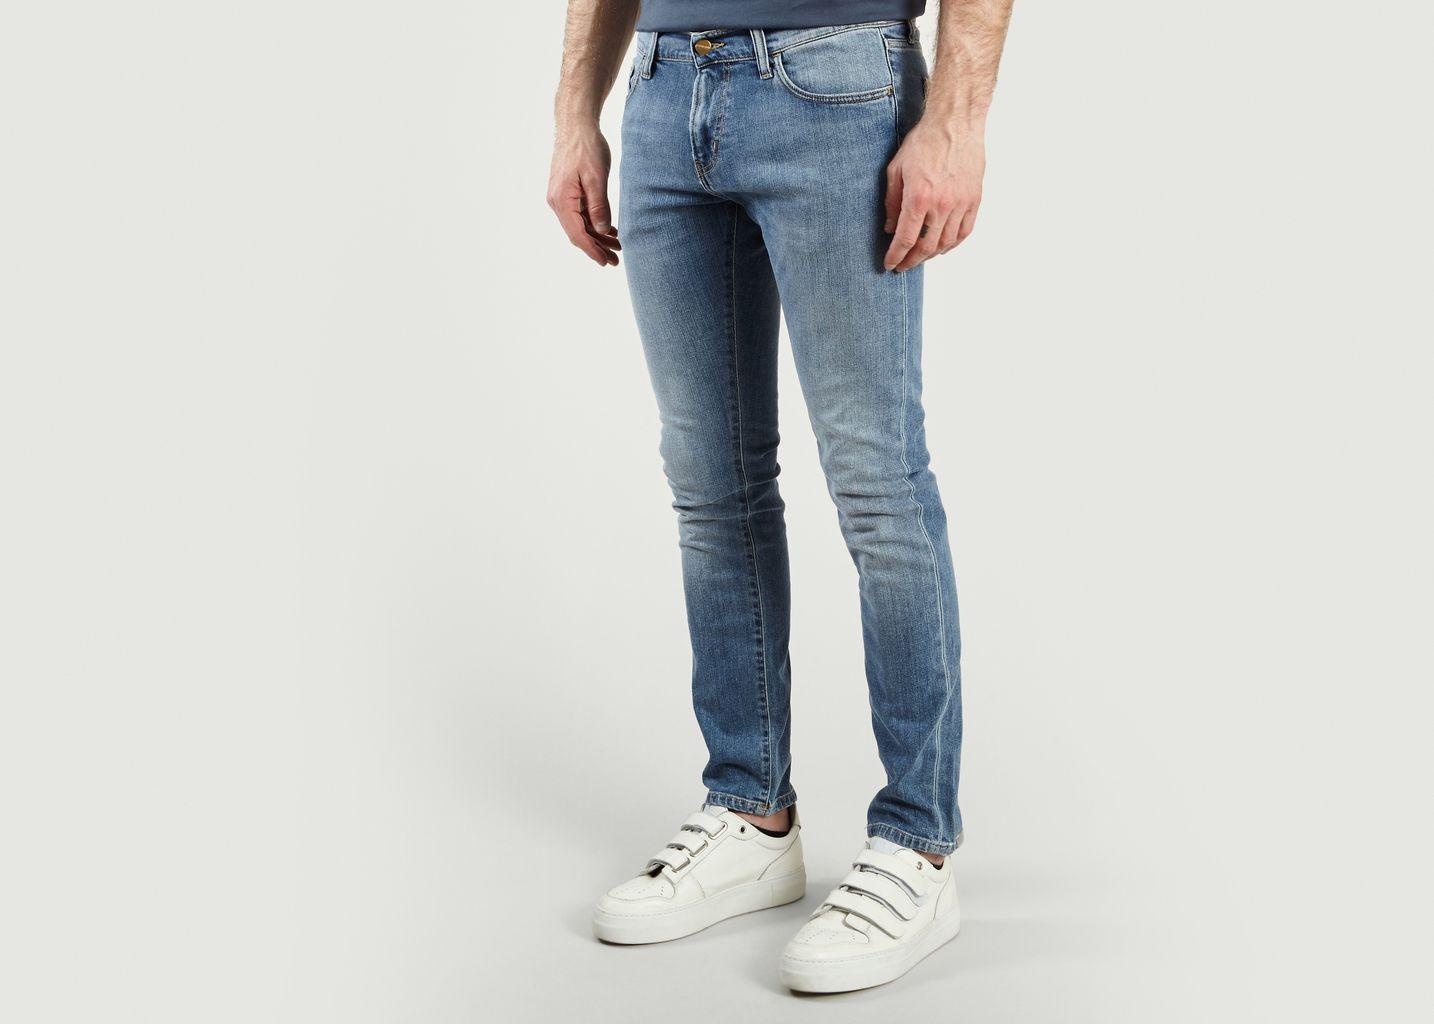 Rebel Jeans - Carhartt WIP